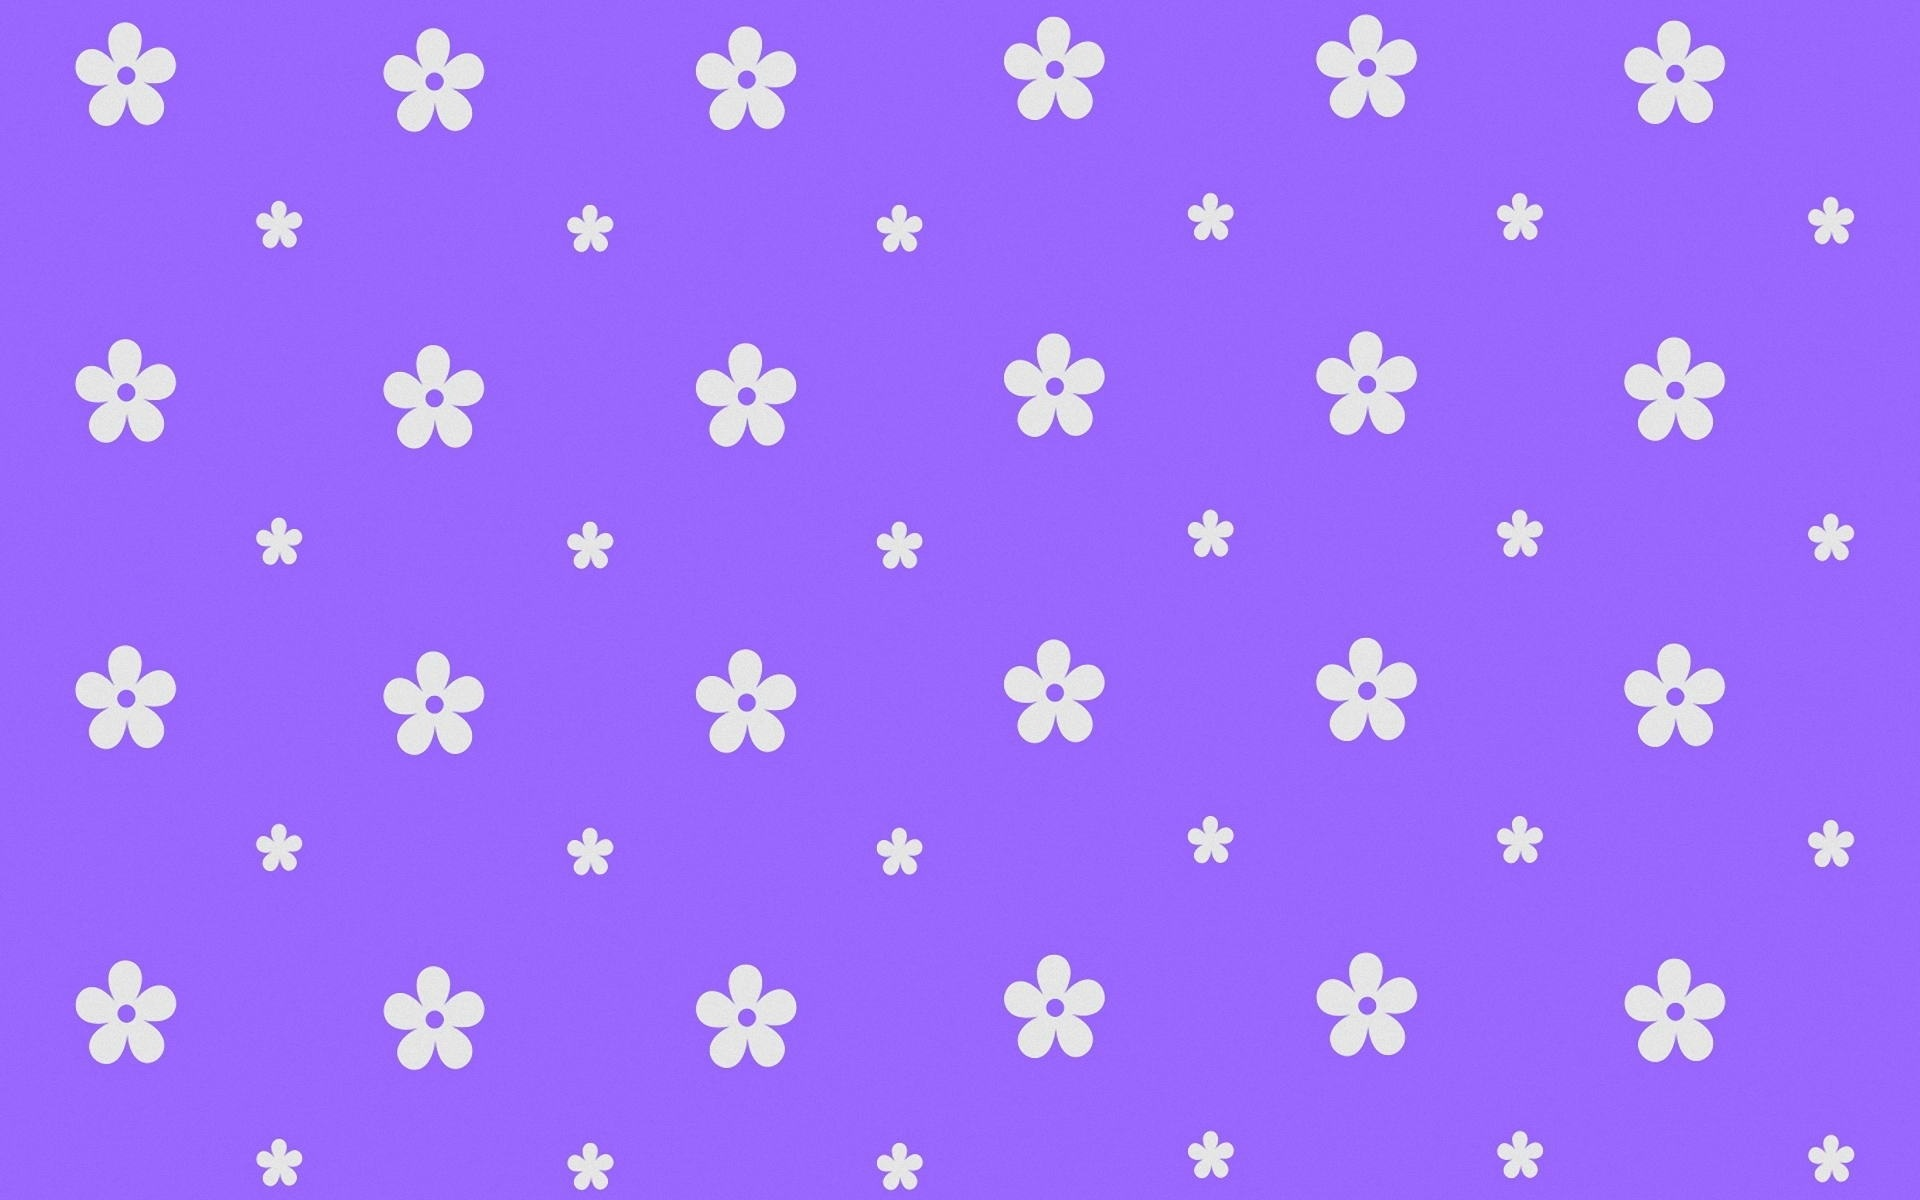 Cute Purple Wallpaper 45997 1920x1200 px HDWallSourcecom 1920x1200